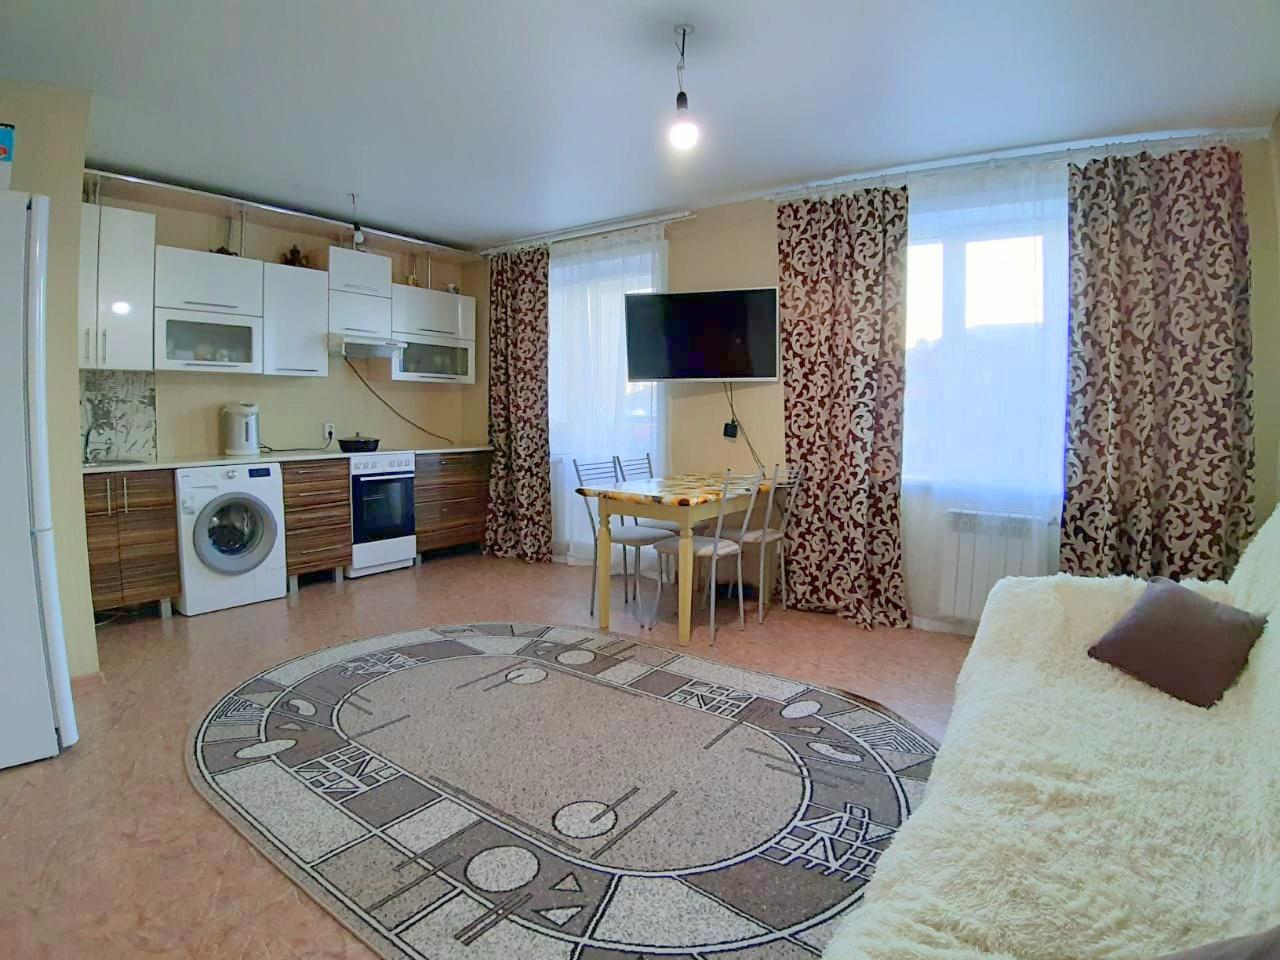 Квартира на продажу по адресу Россия, Алтайский край, Бийск, ул. Александра Матросова, 31